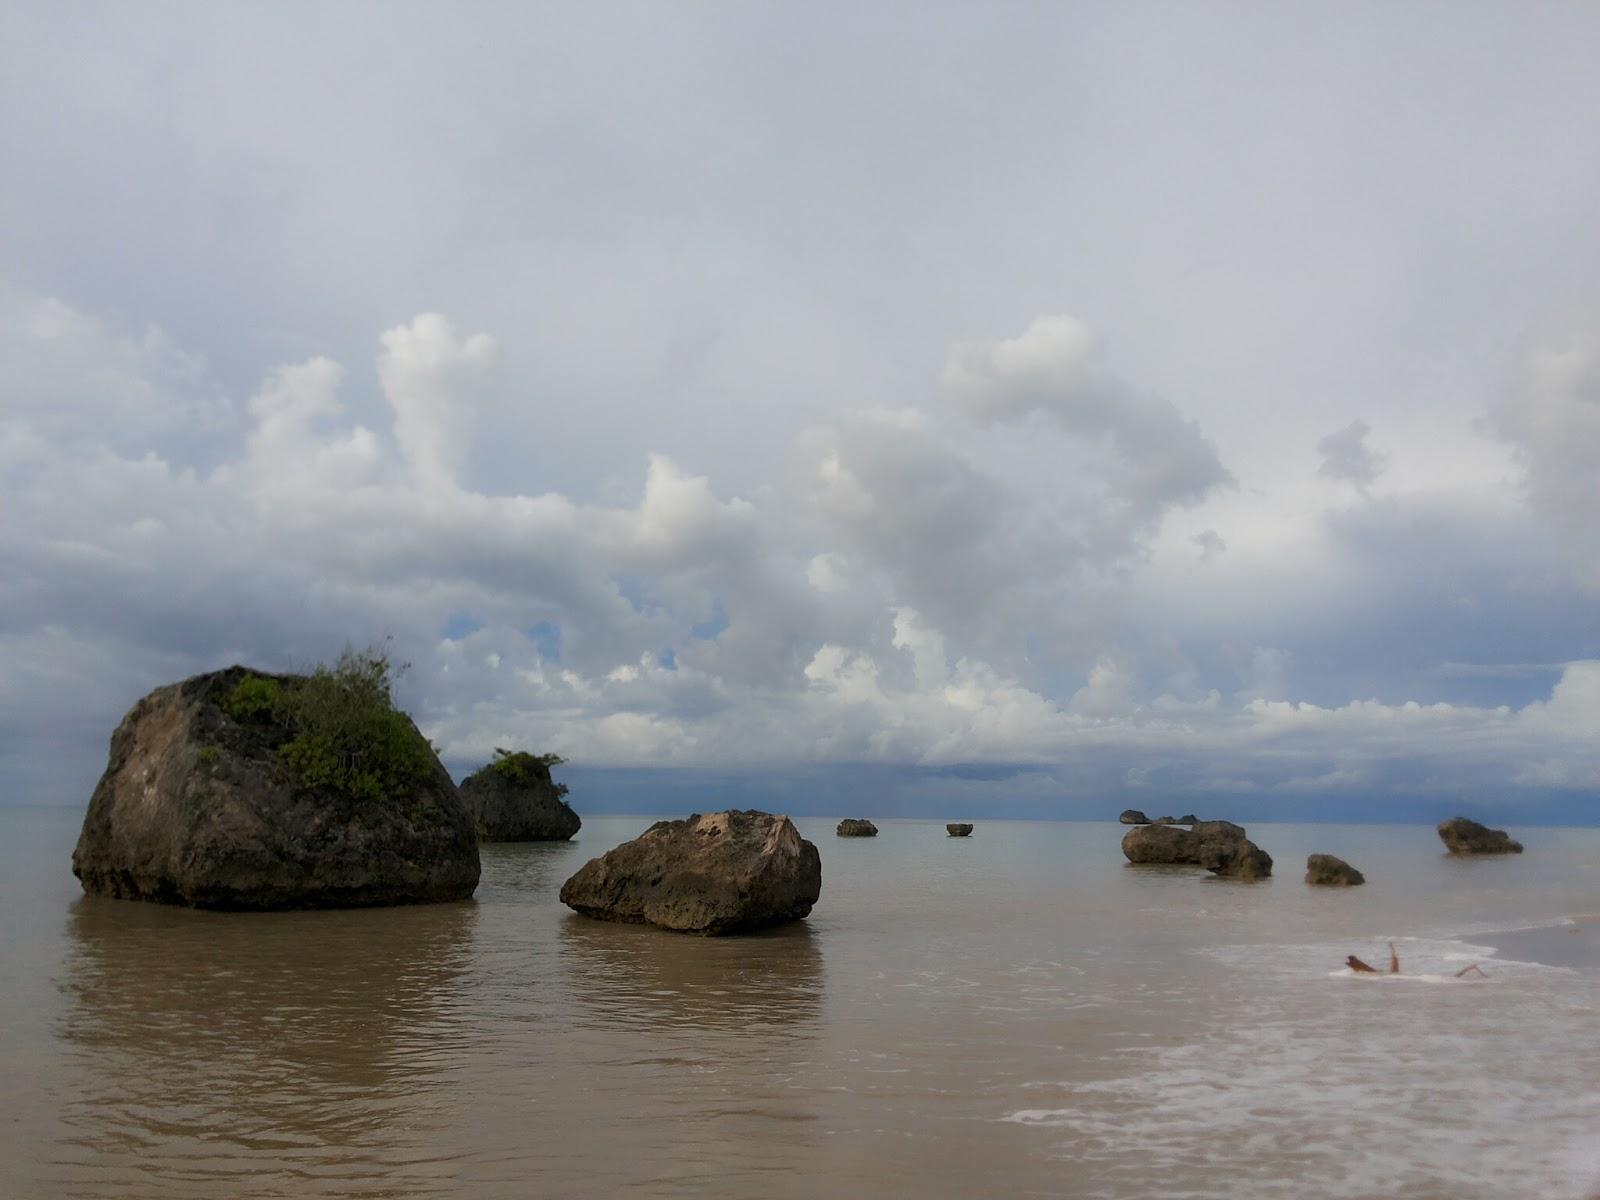 Arianto Ntt Pantai Leli Kabupaten Rote Ndao Batu Karang Hitam